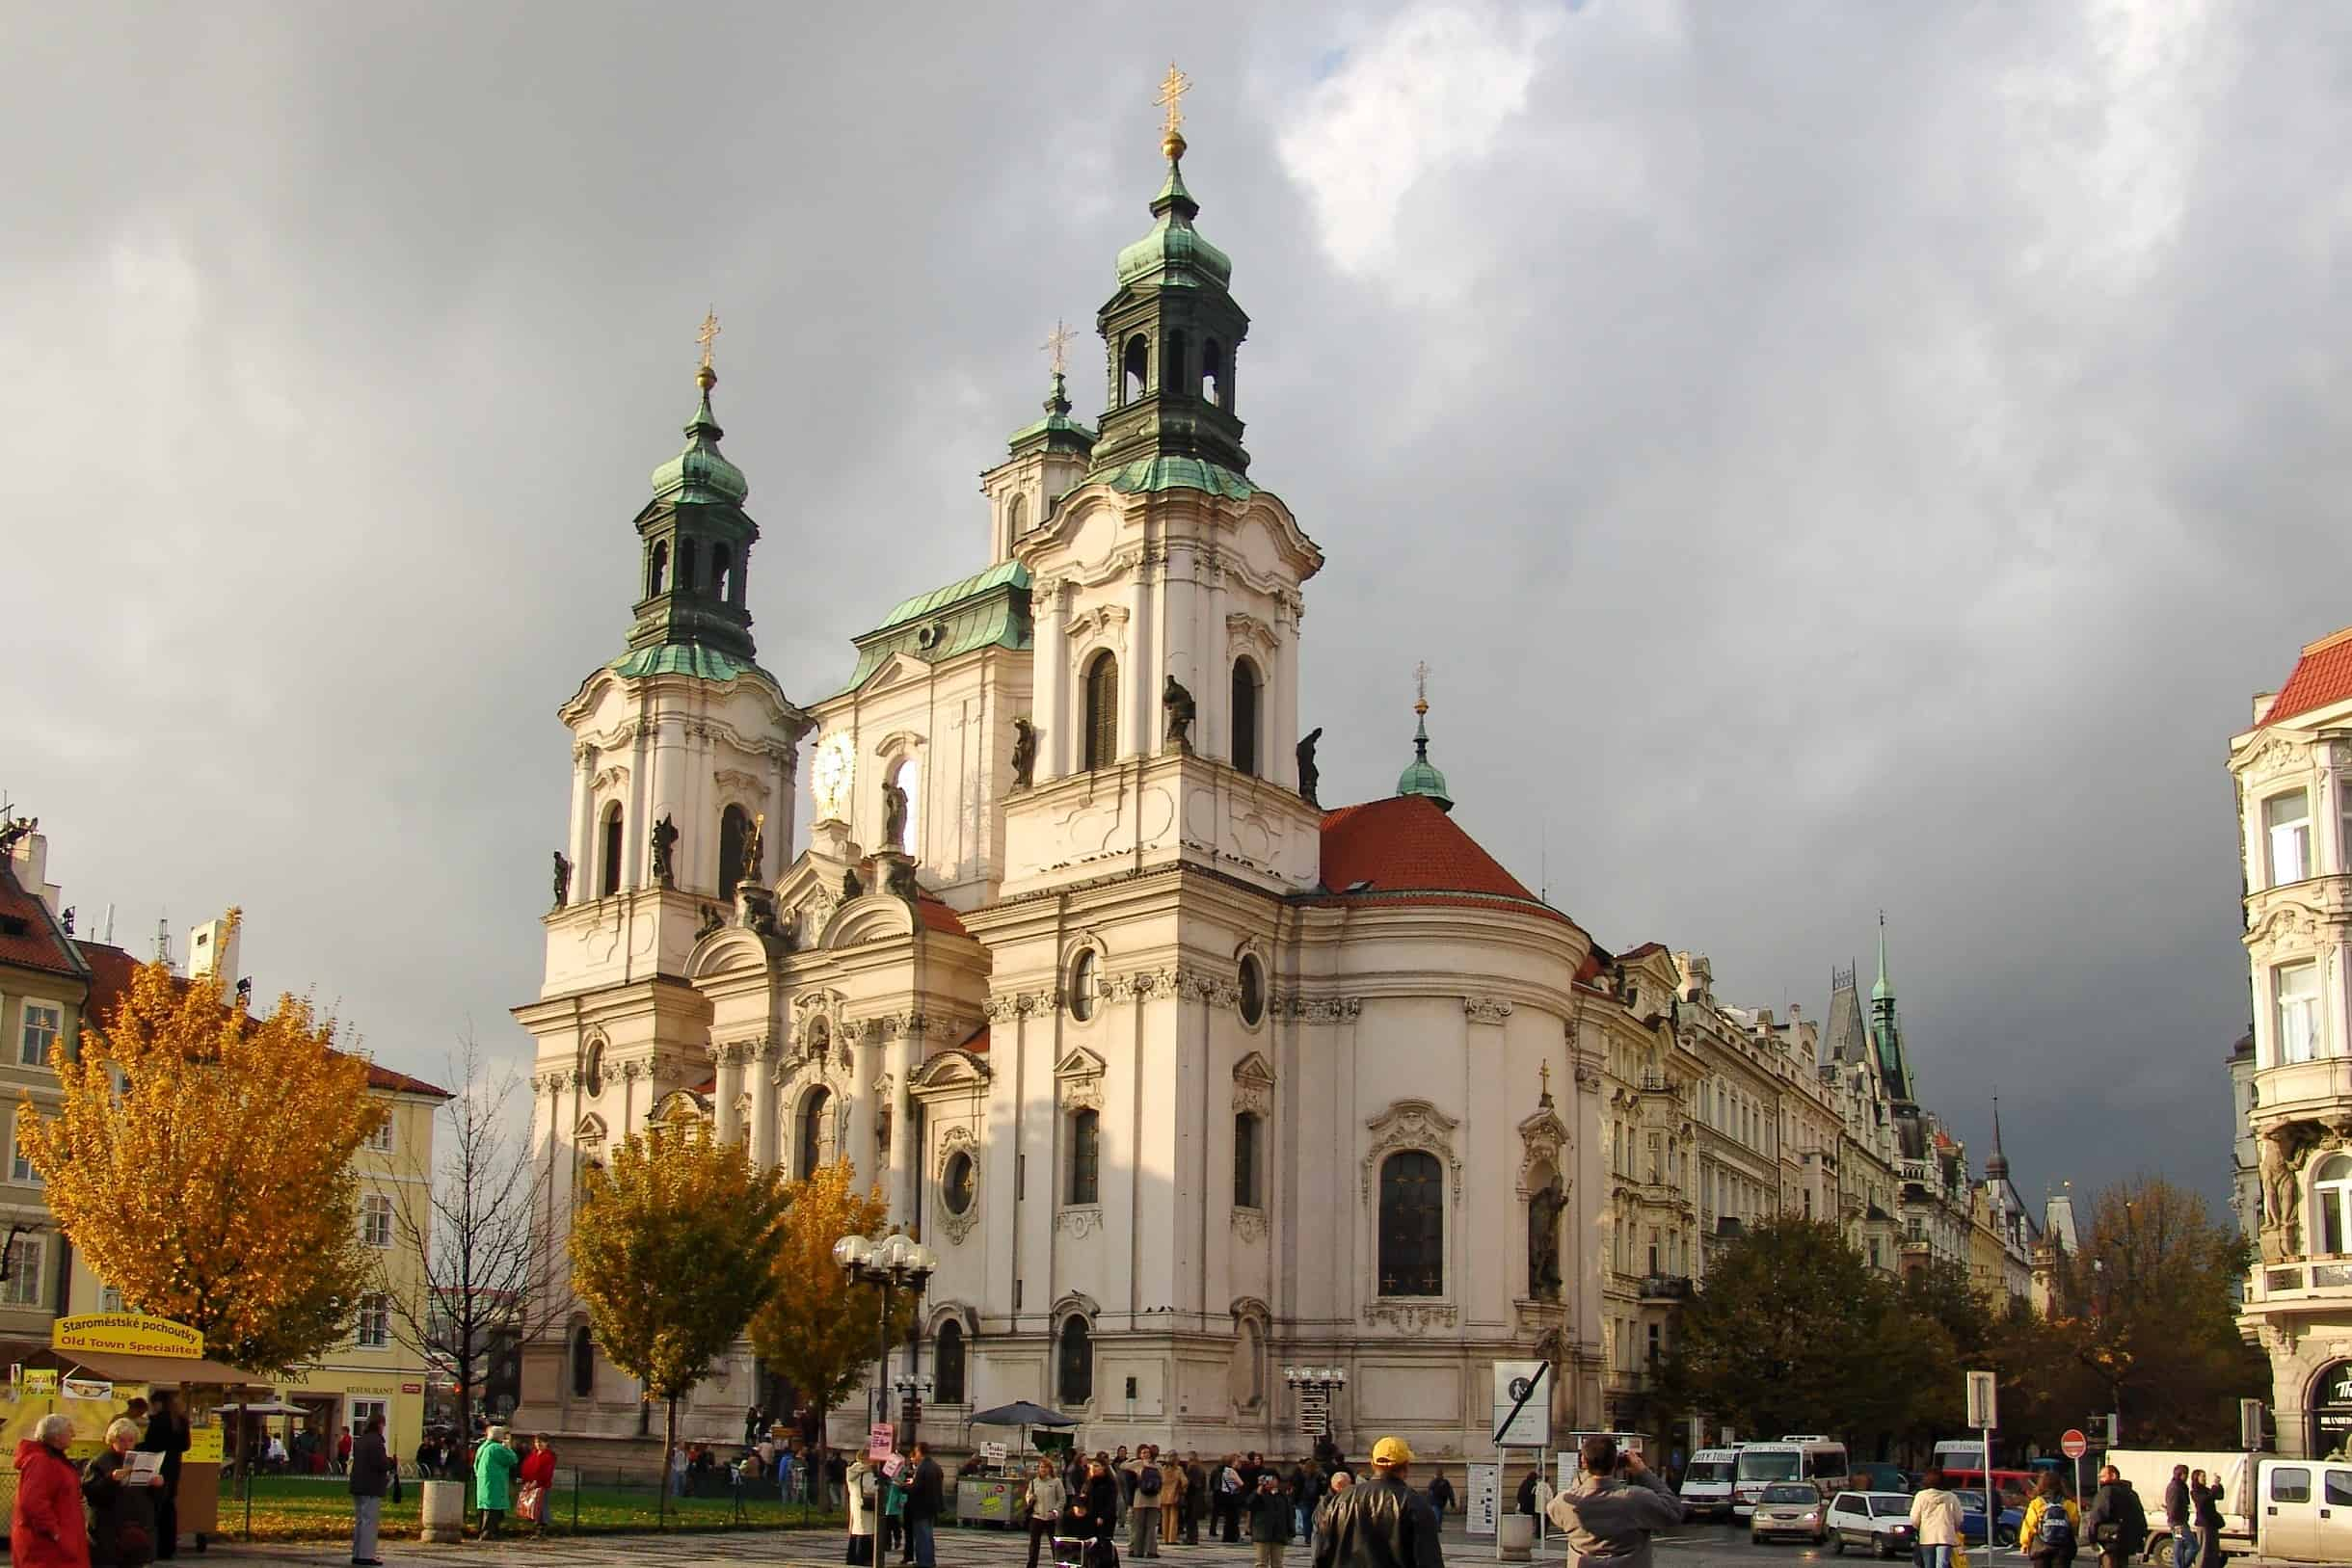 St. Nicholas Church (Staré Město)